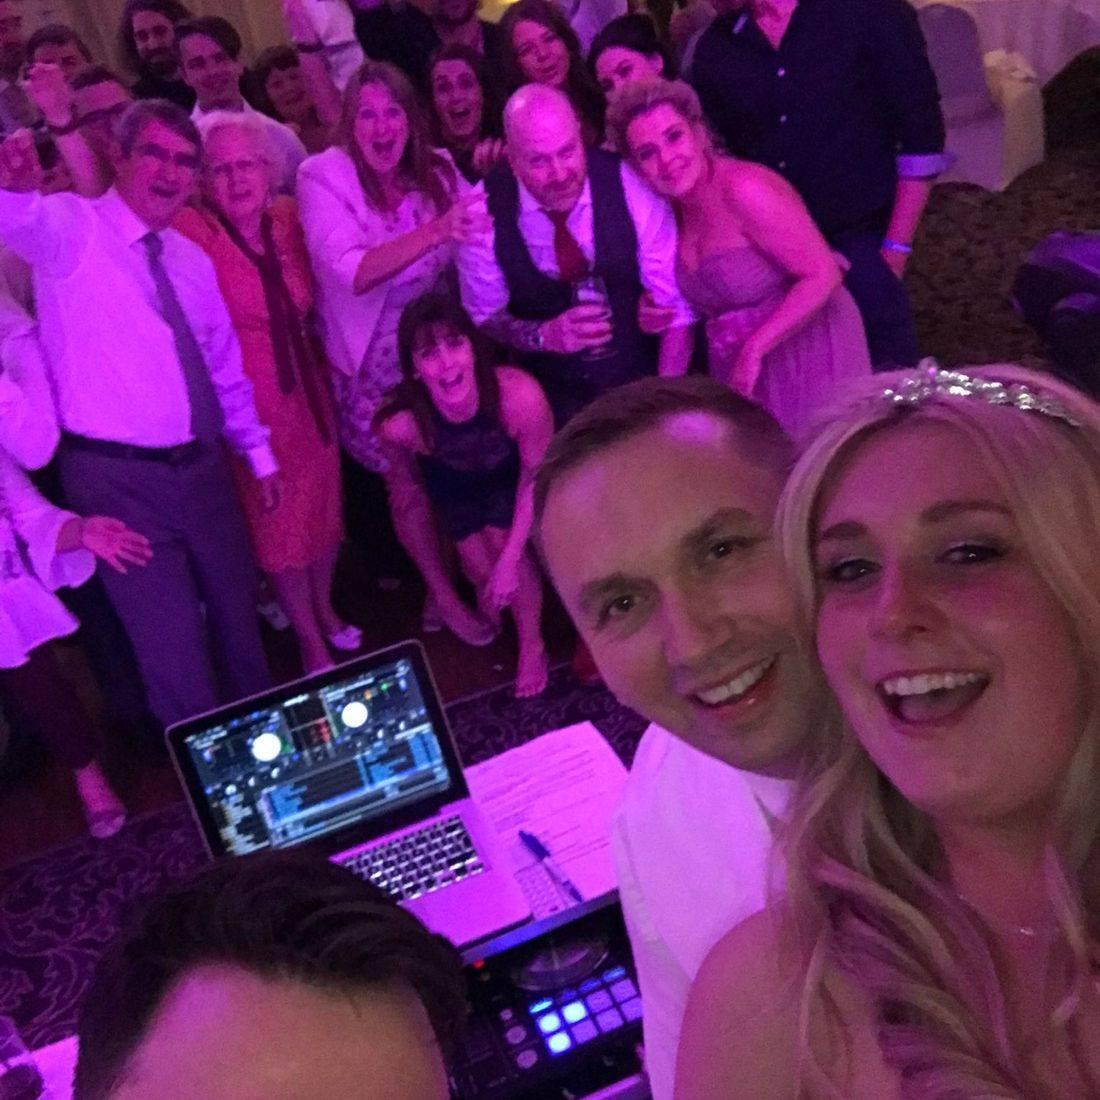 Wedding DJ New Hall Birmingham, #DJ #WeddingDJ #birmingham